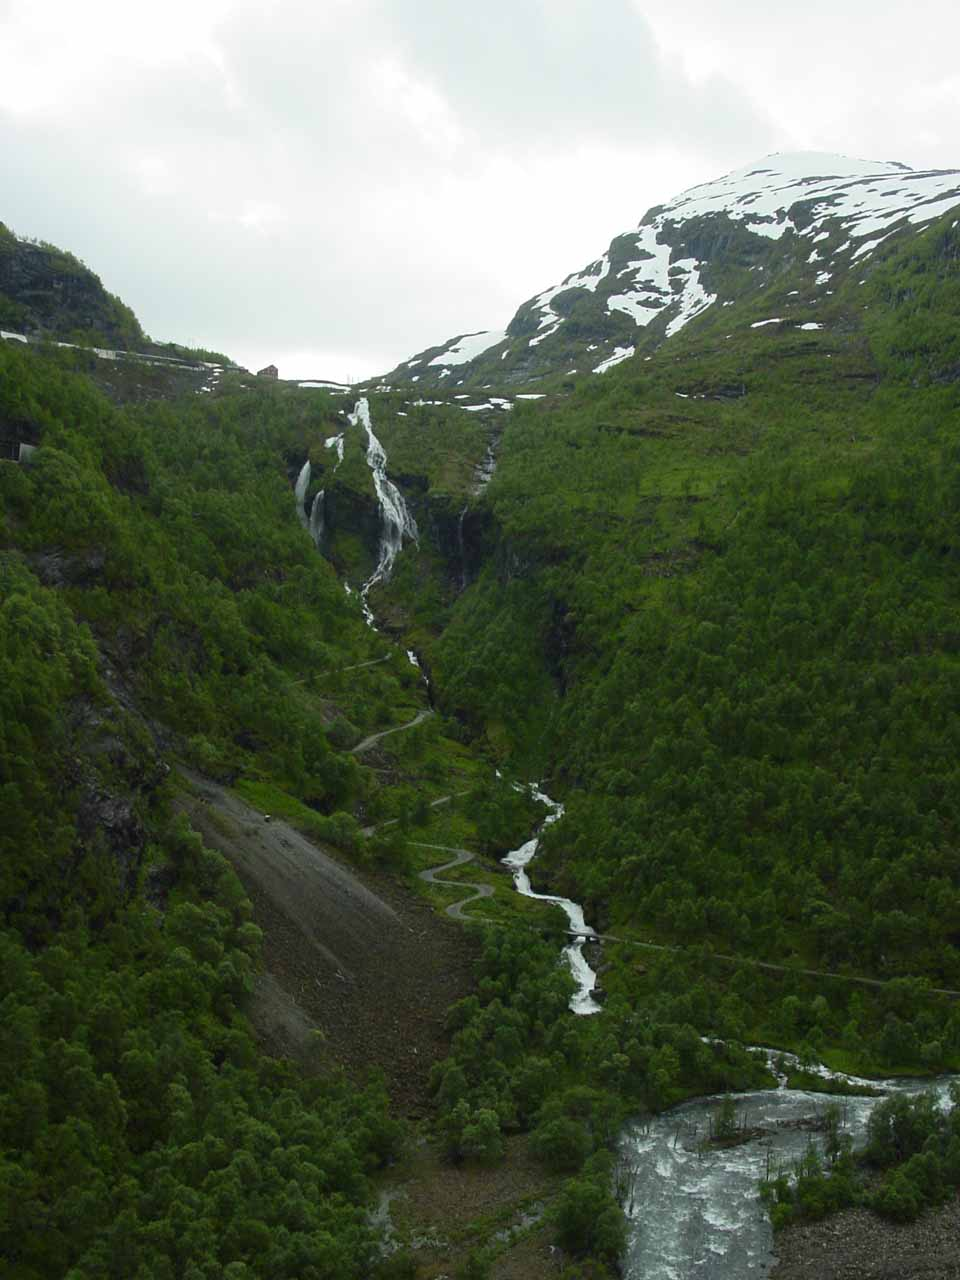 Impressively tall waterfall we've informally called 'Myrdalsfossen' tumbling alongside a twisty local road high up in Flåmsdalen Valley